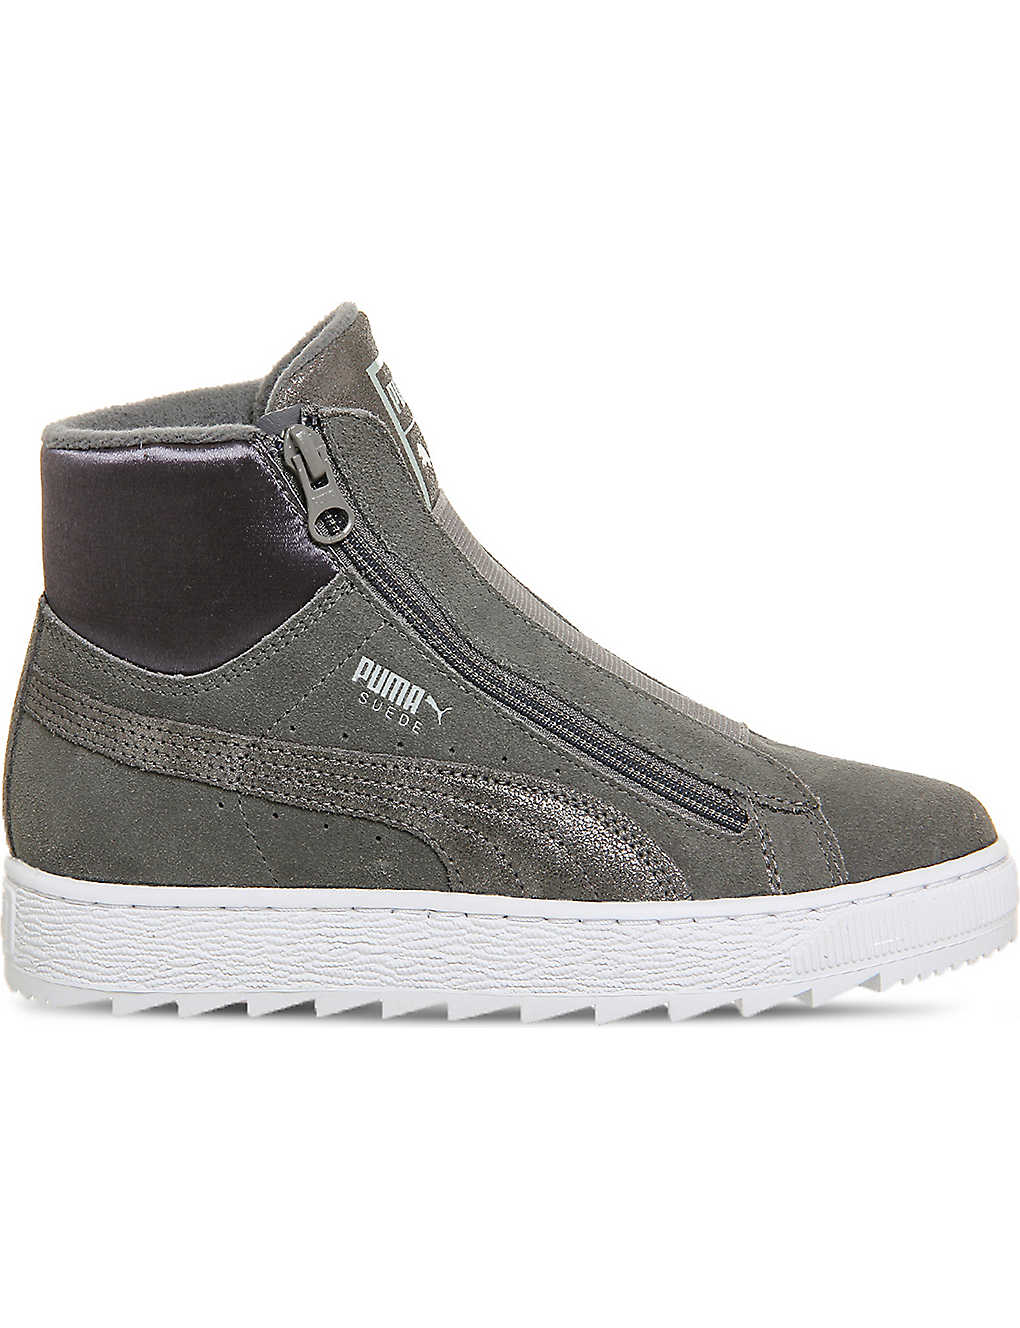 buy online 53f7d 6f233 PUMA - Suede classic high-top trainers | Selfridges.com